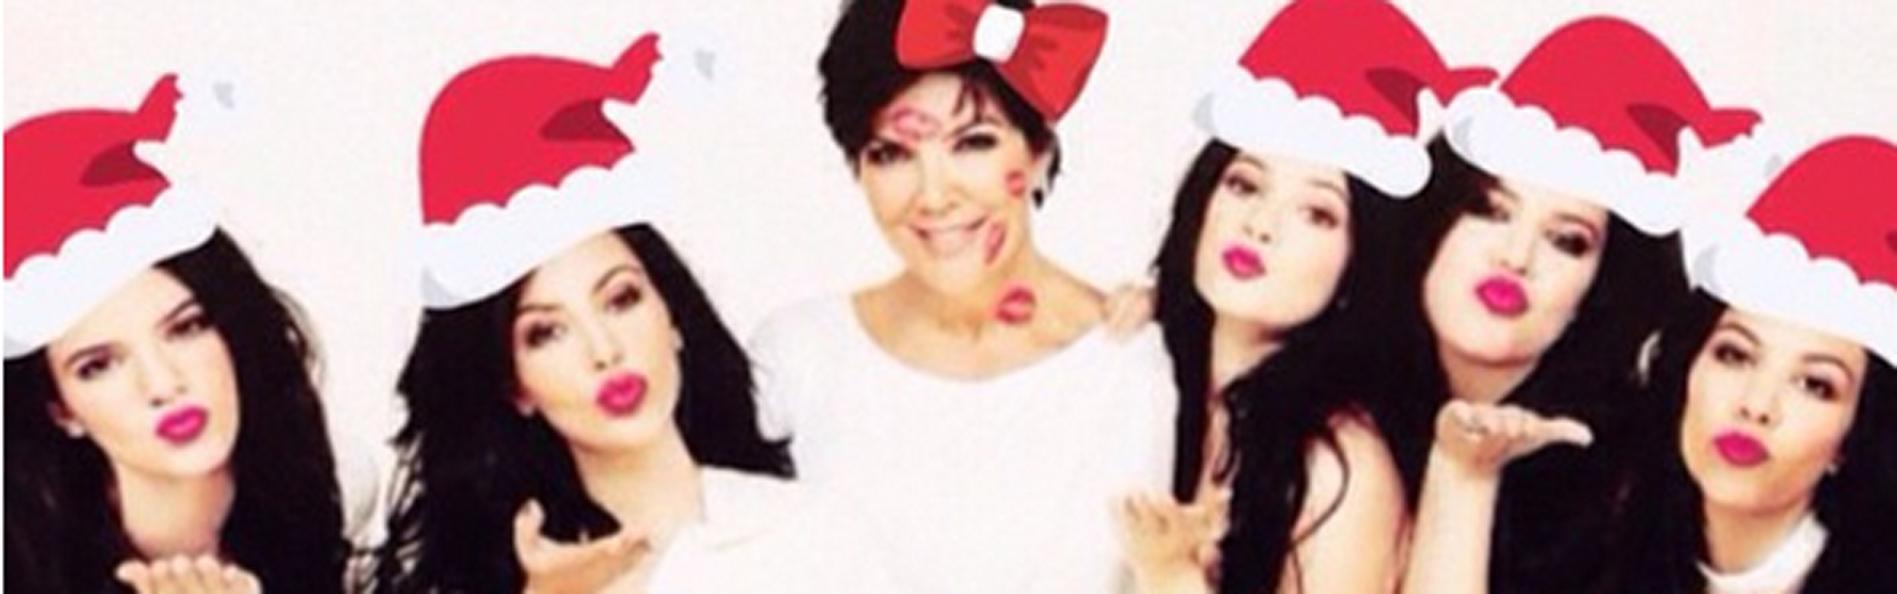 navidad kris jenner Foto: Instagram / Kris Jenner